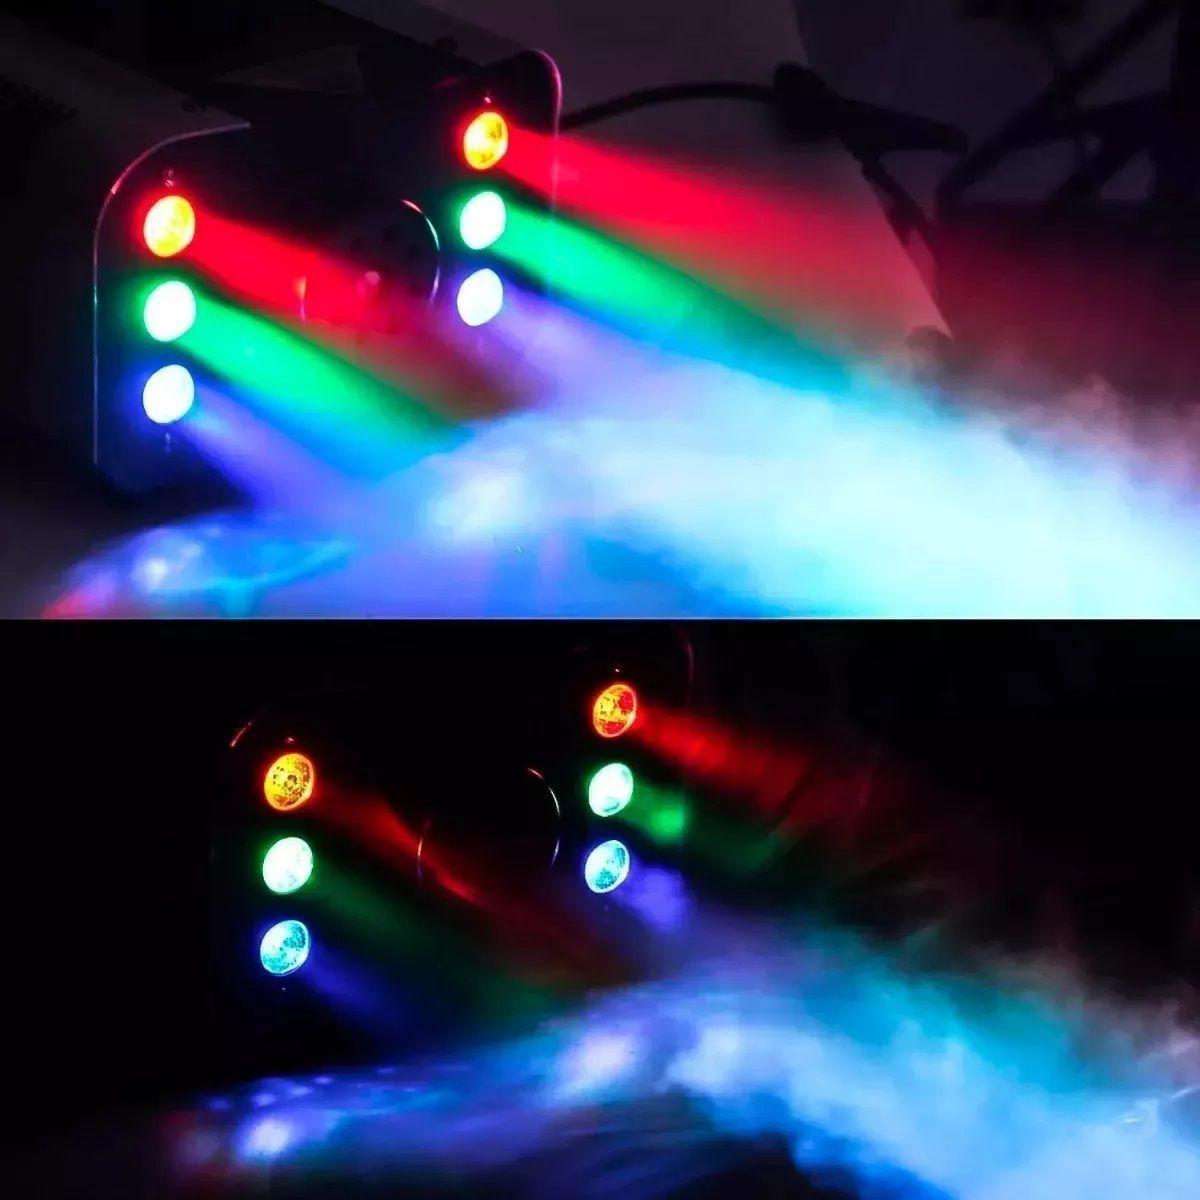 Kit Canhão 18 Leds RGB + Strobo 12 Leds Branco + Máquina Fumaça 1200W + Líquido - 18LEDSLIM+12LEDBR+XH-1200W